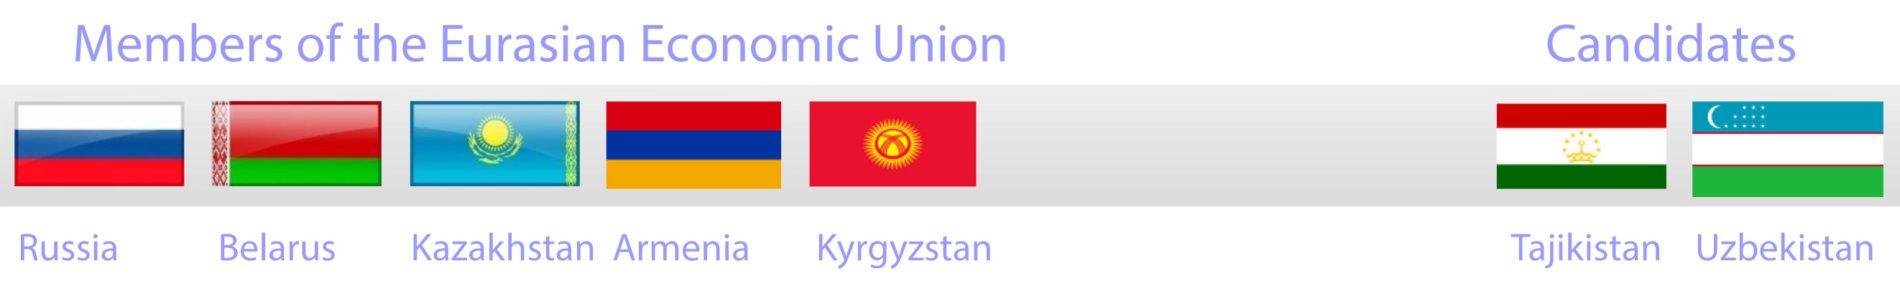 Advantages of the location Belarus